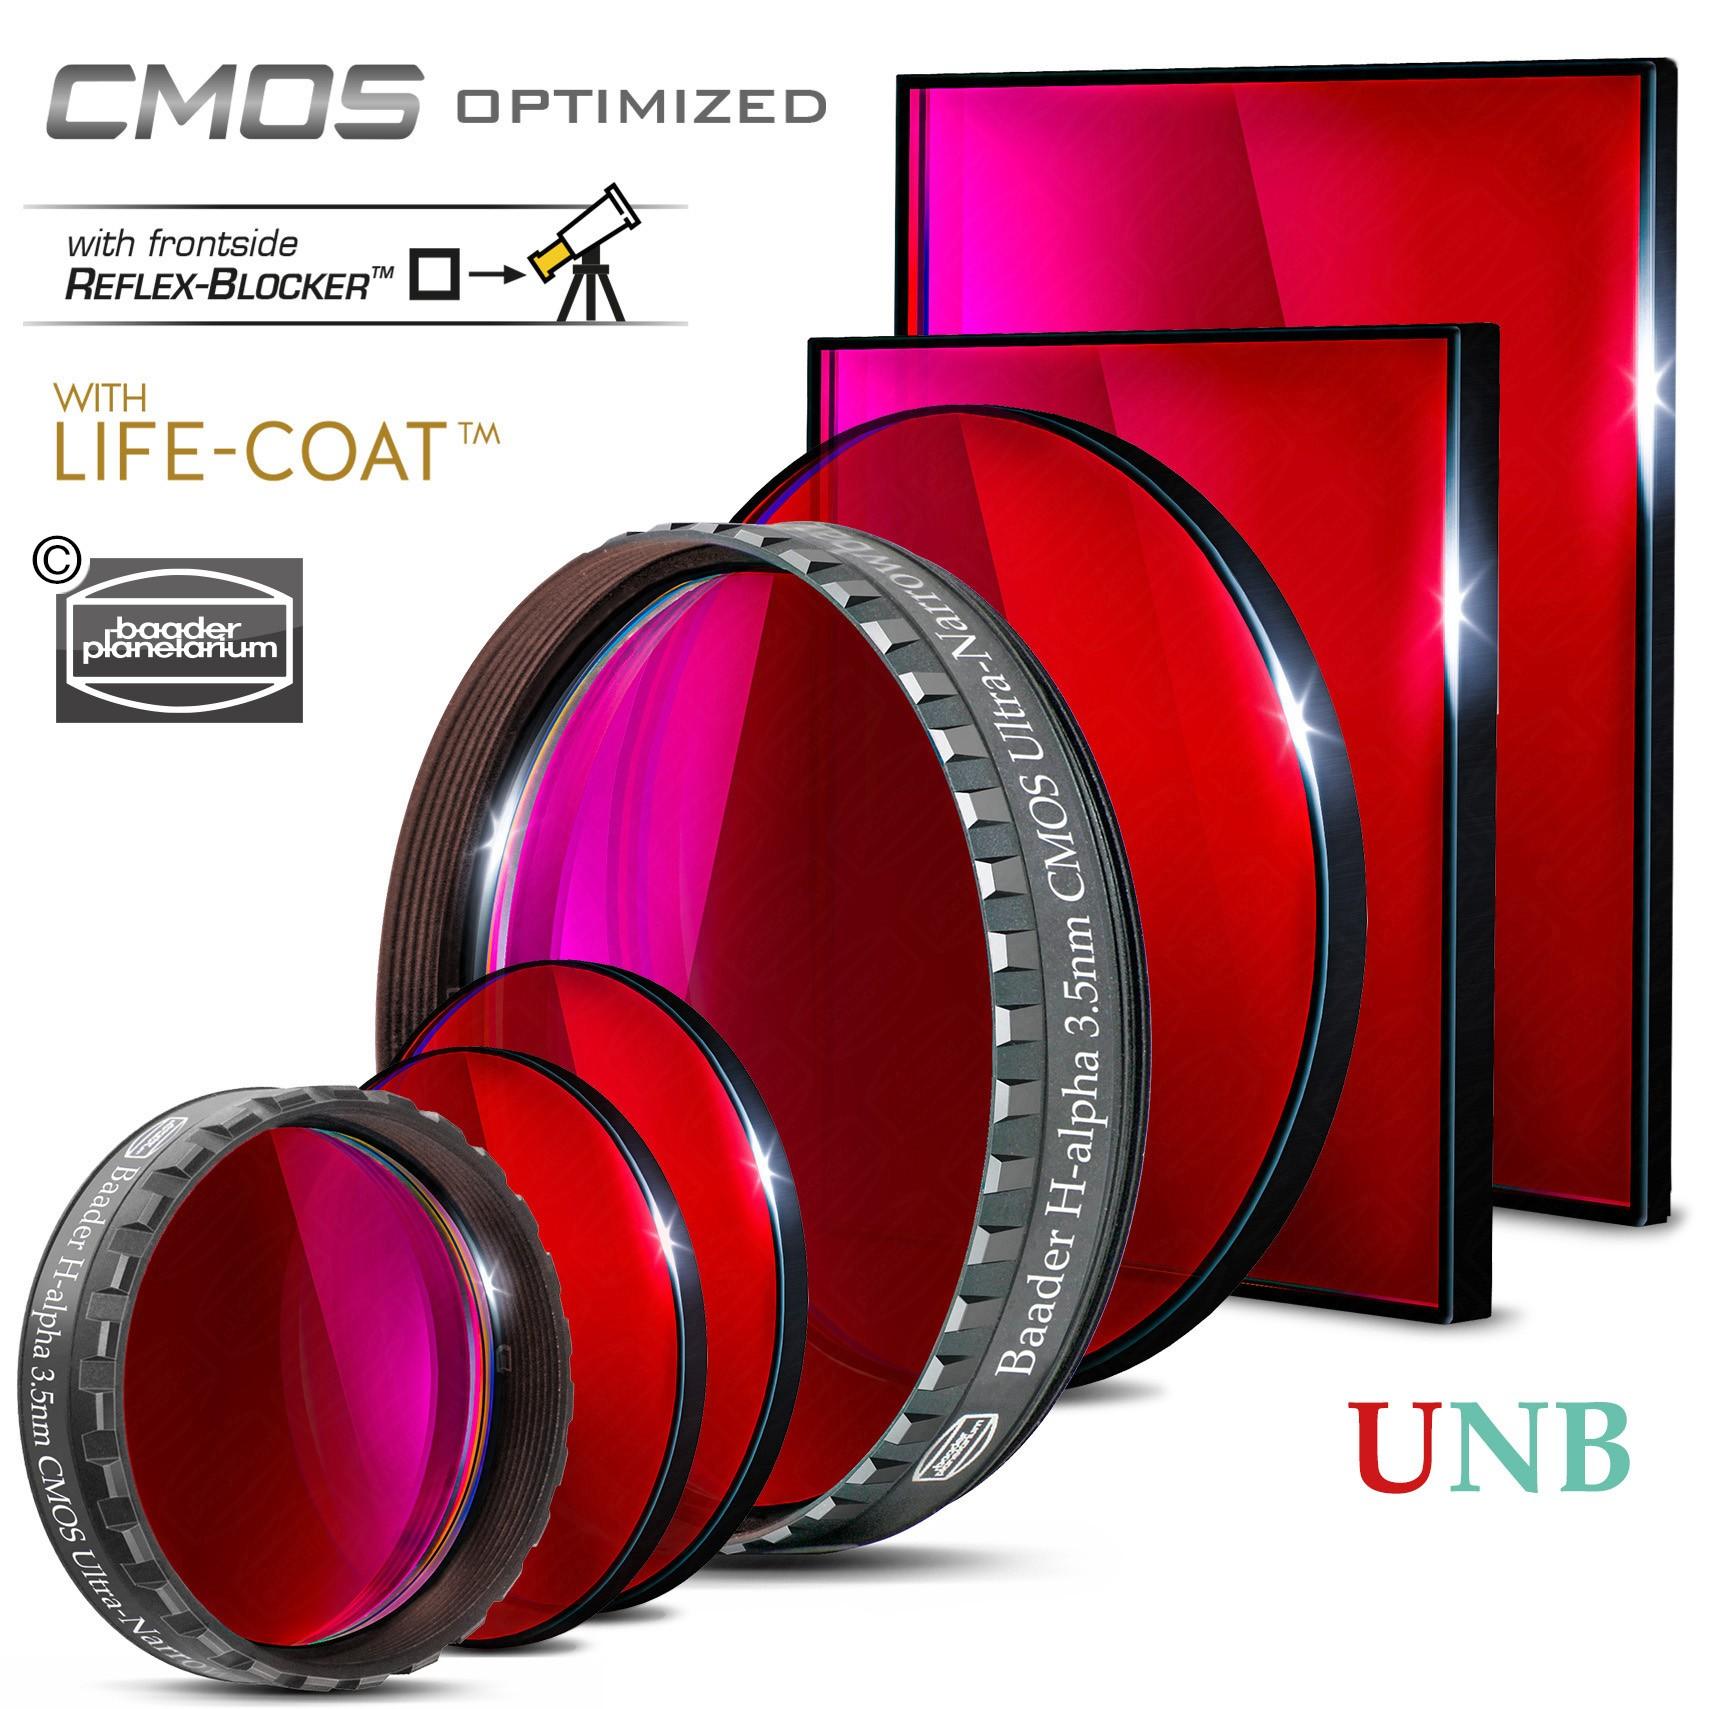 Baader H-alpha Ultra-Narrowband-Filters (3.5nm) – CMOS-optimized